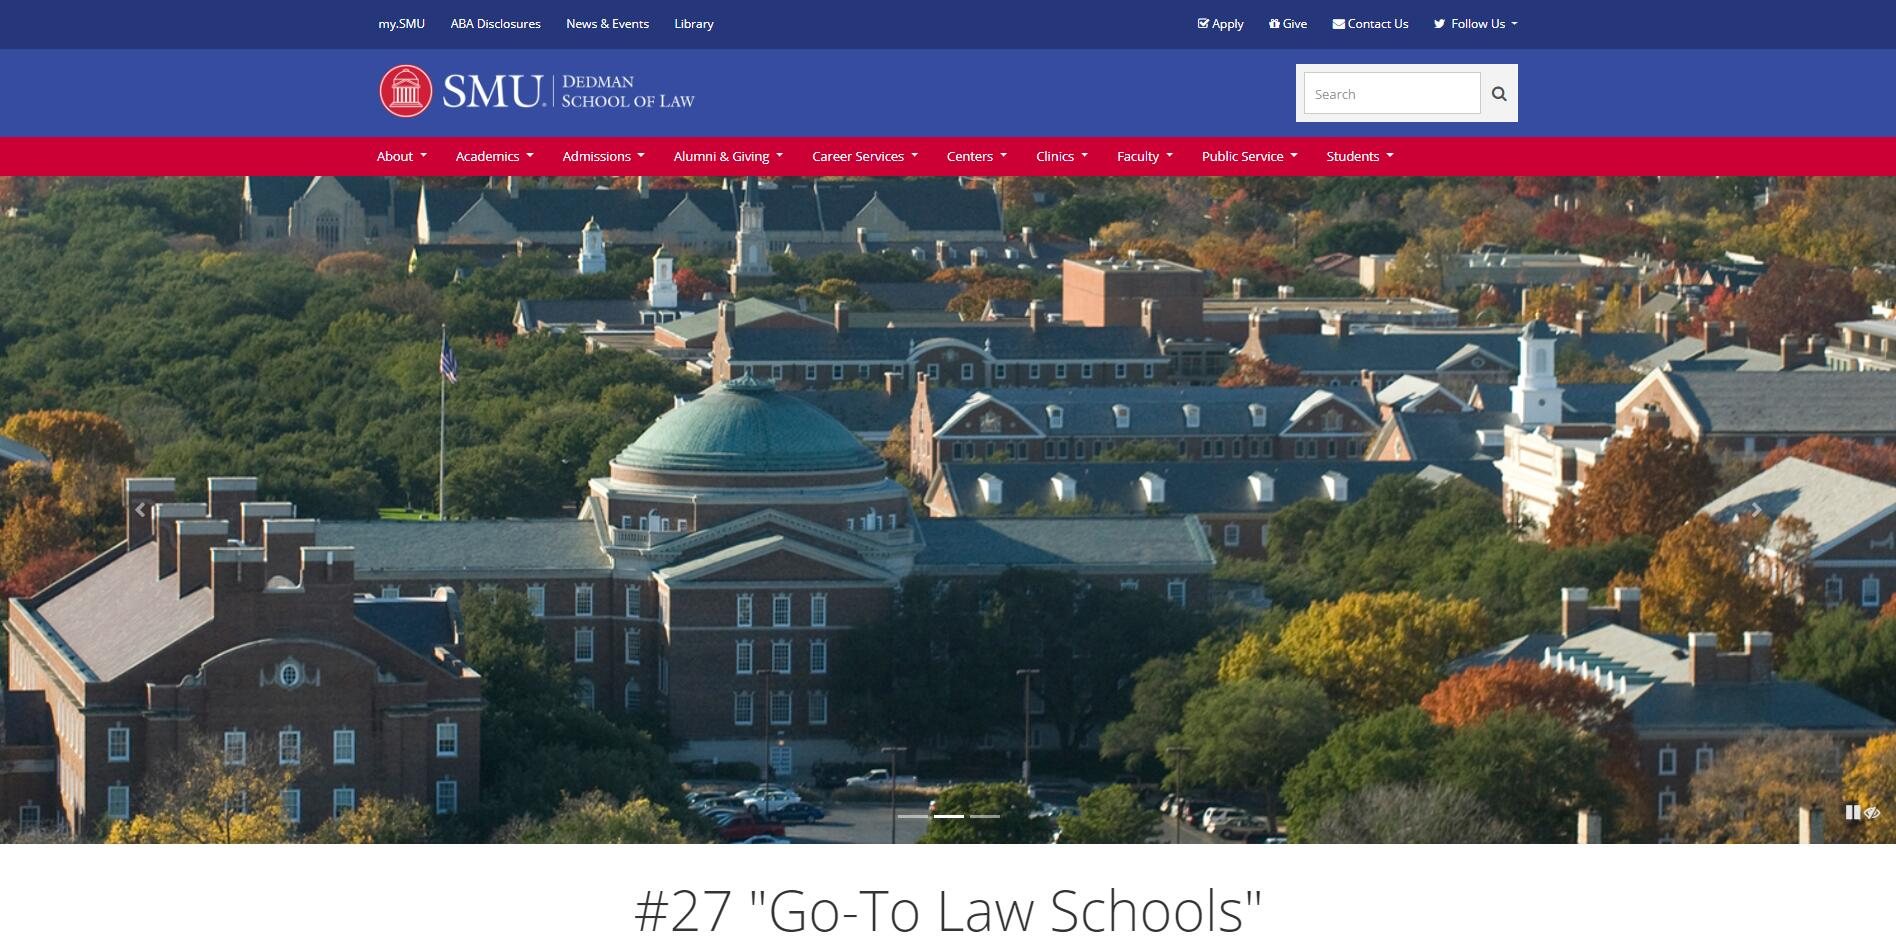 The Dedman School of Law at Southern Methodist University